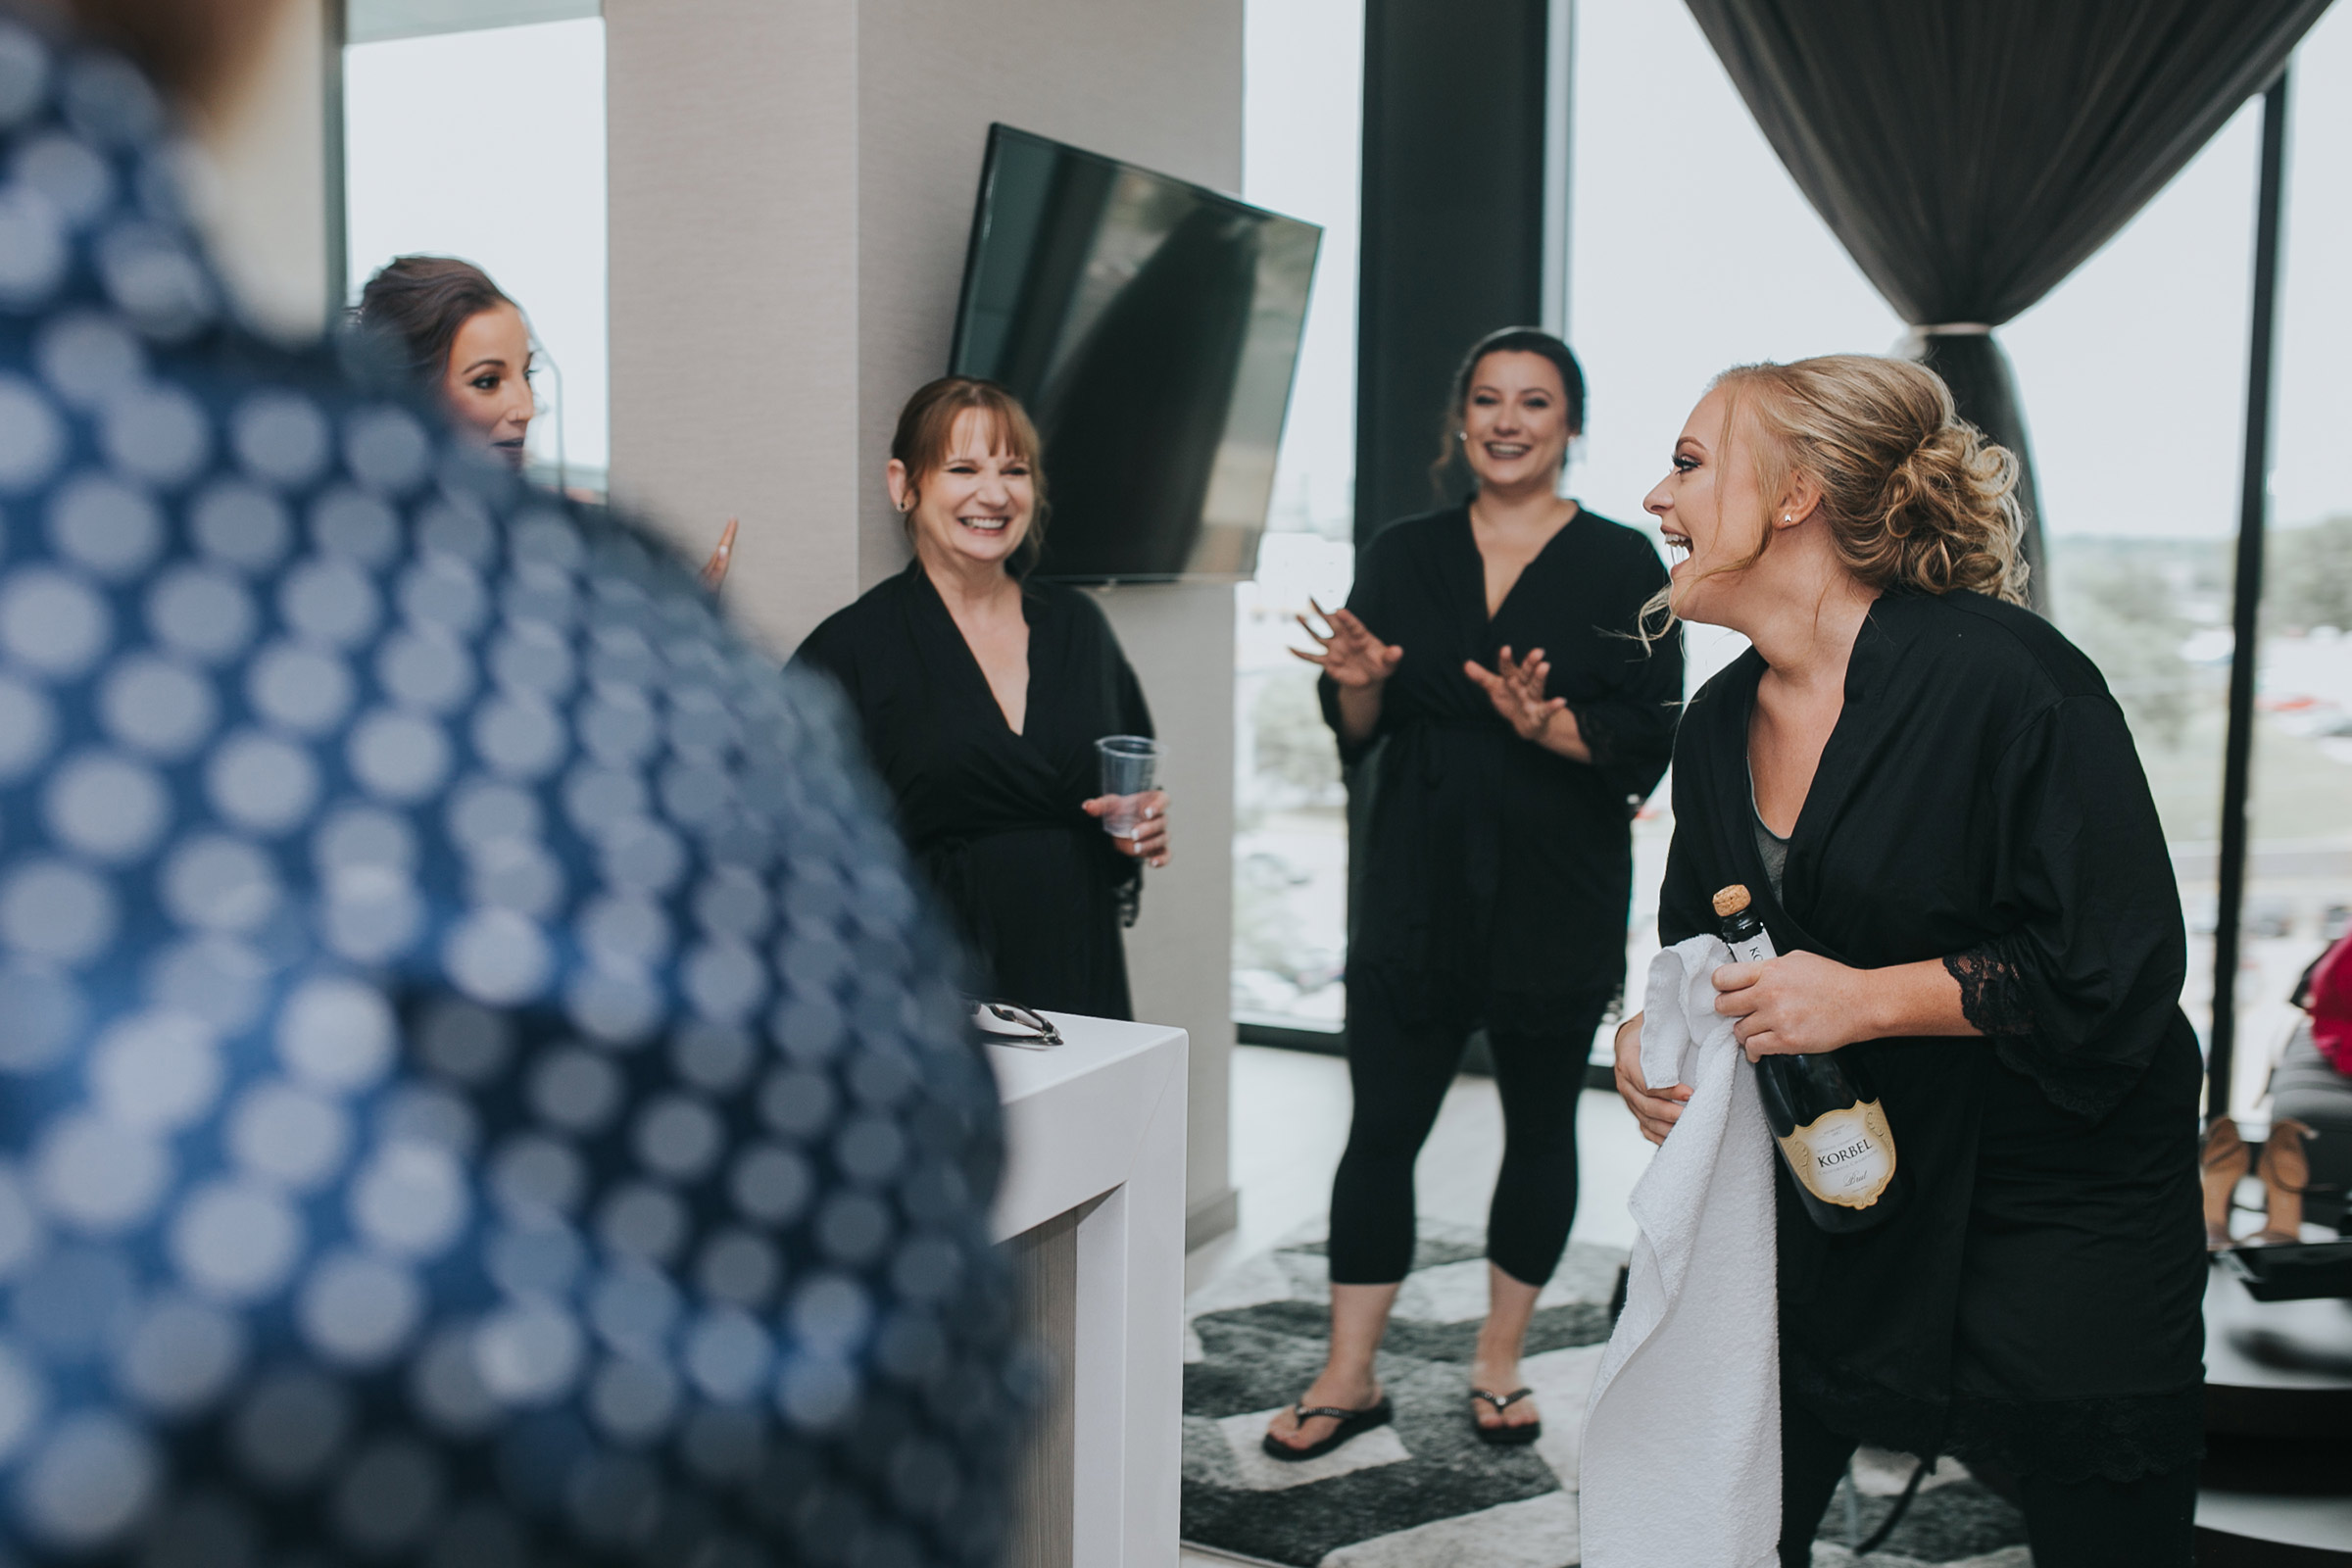 bridesmaid-opening-champagne-desmoines-iowa-ac-hotel-raelyn-ramey-photography.jpg